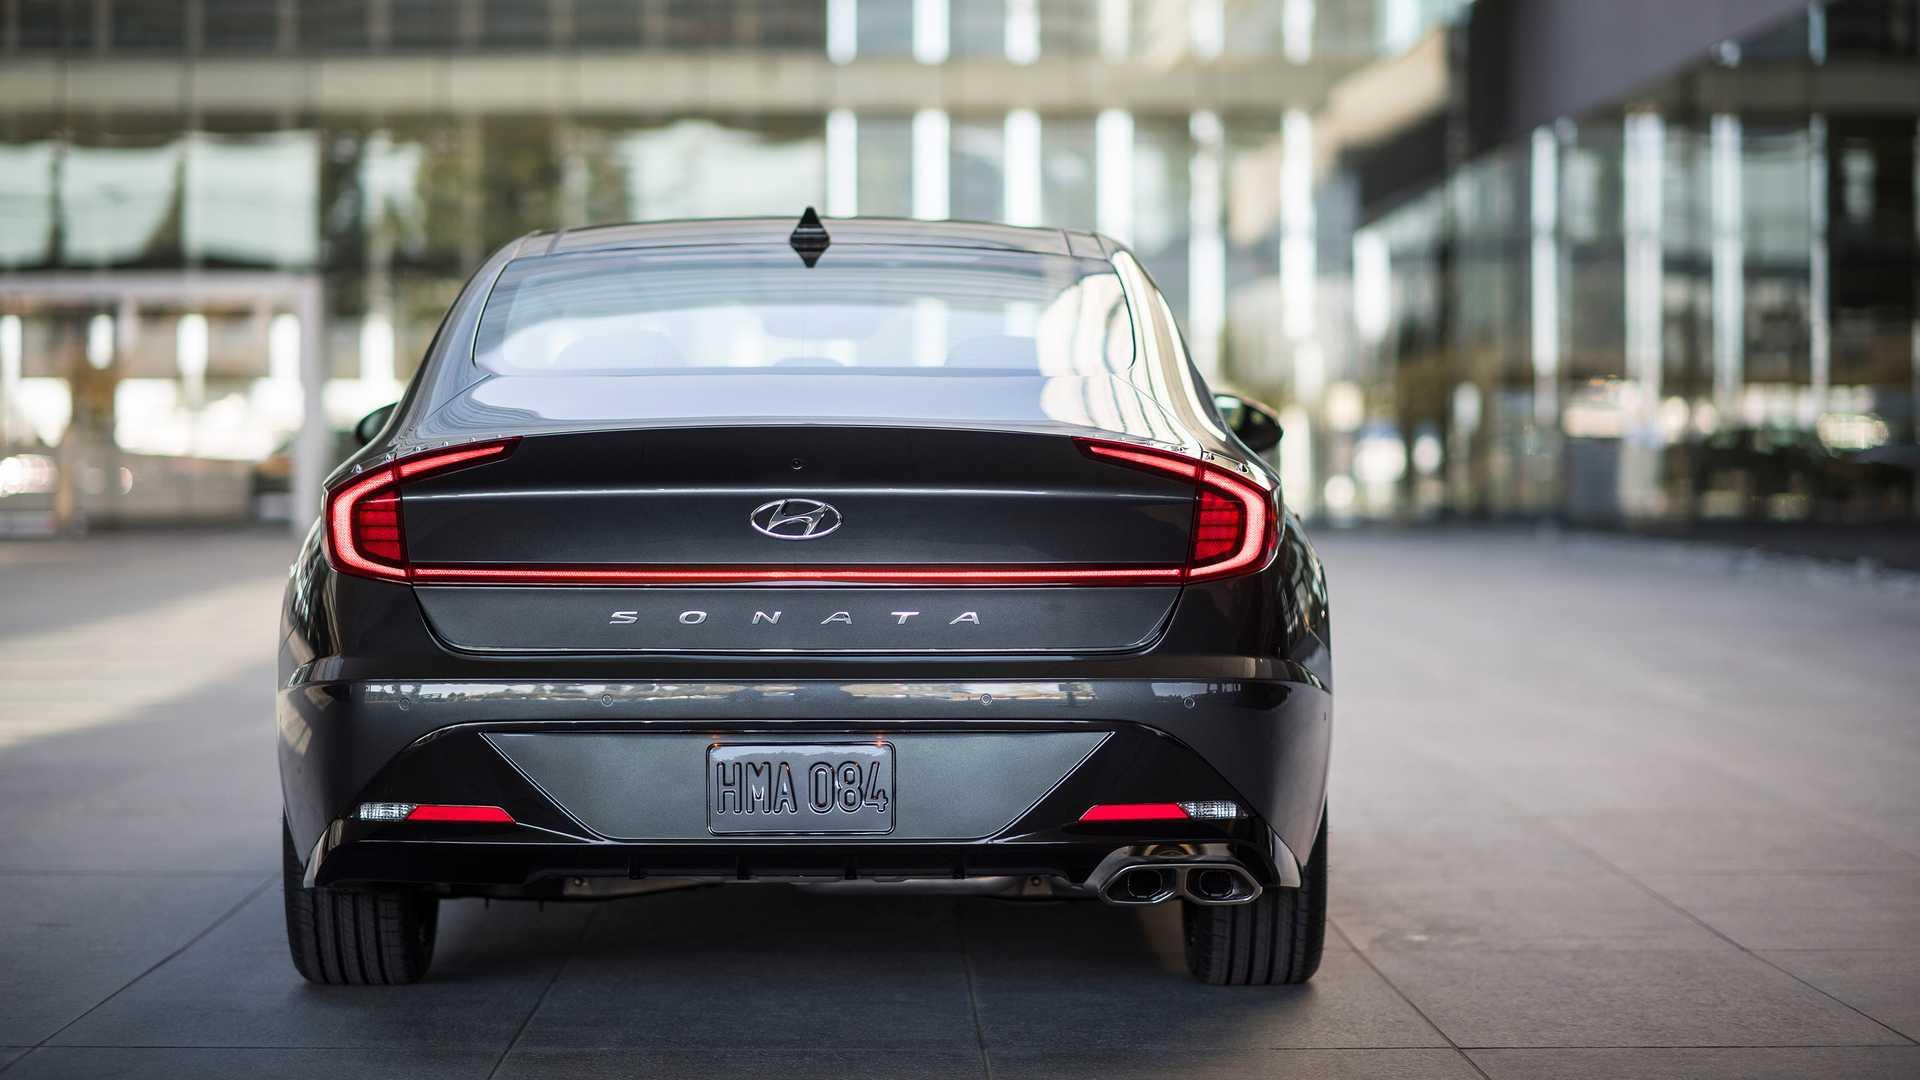 Hyundai Sonata и Kia Optima получат систему полного привода, почти как на BMW M5